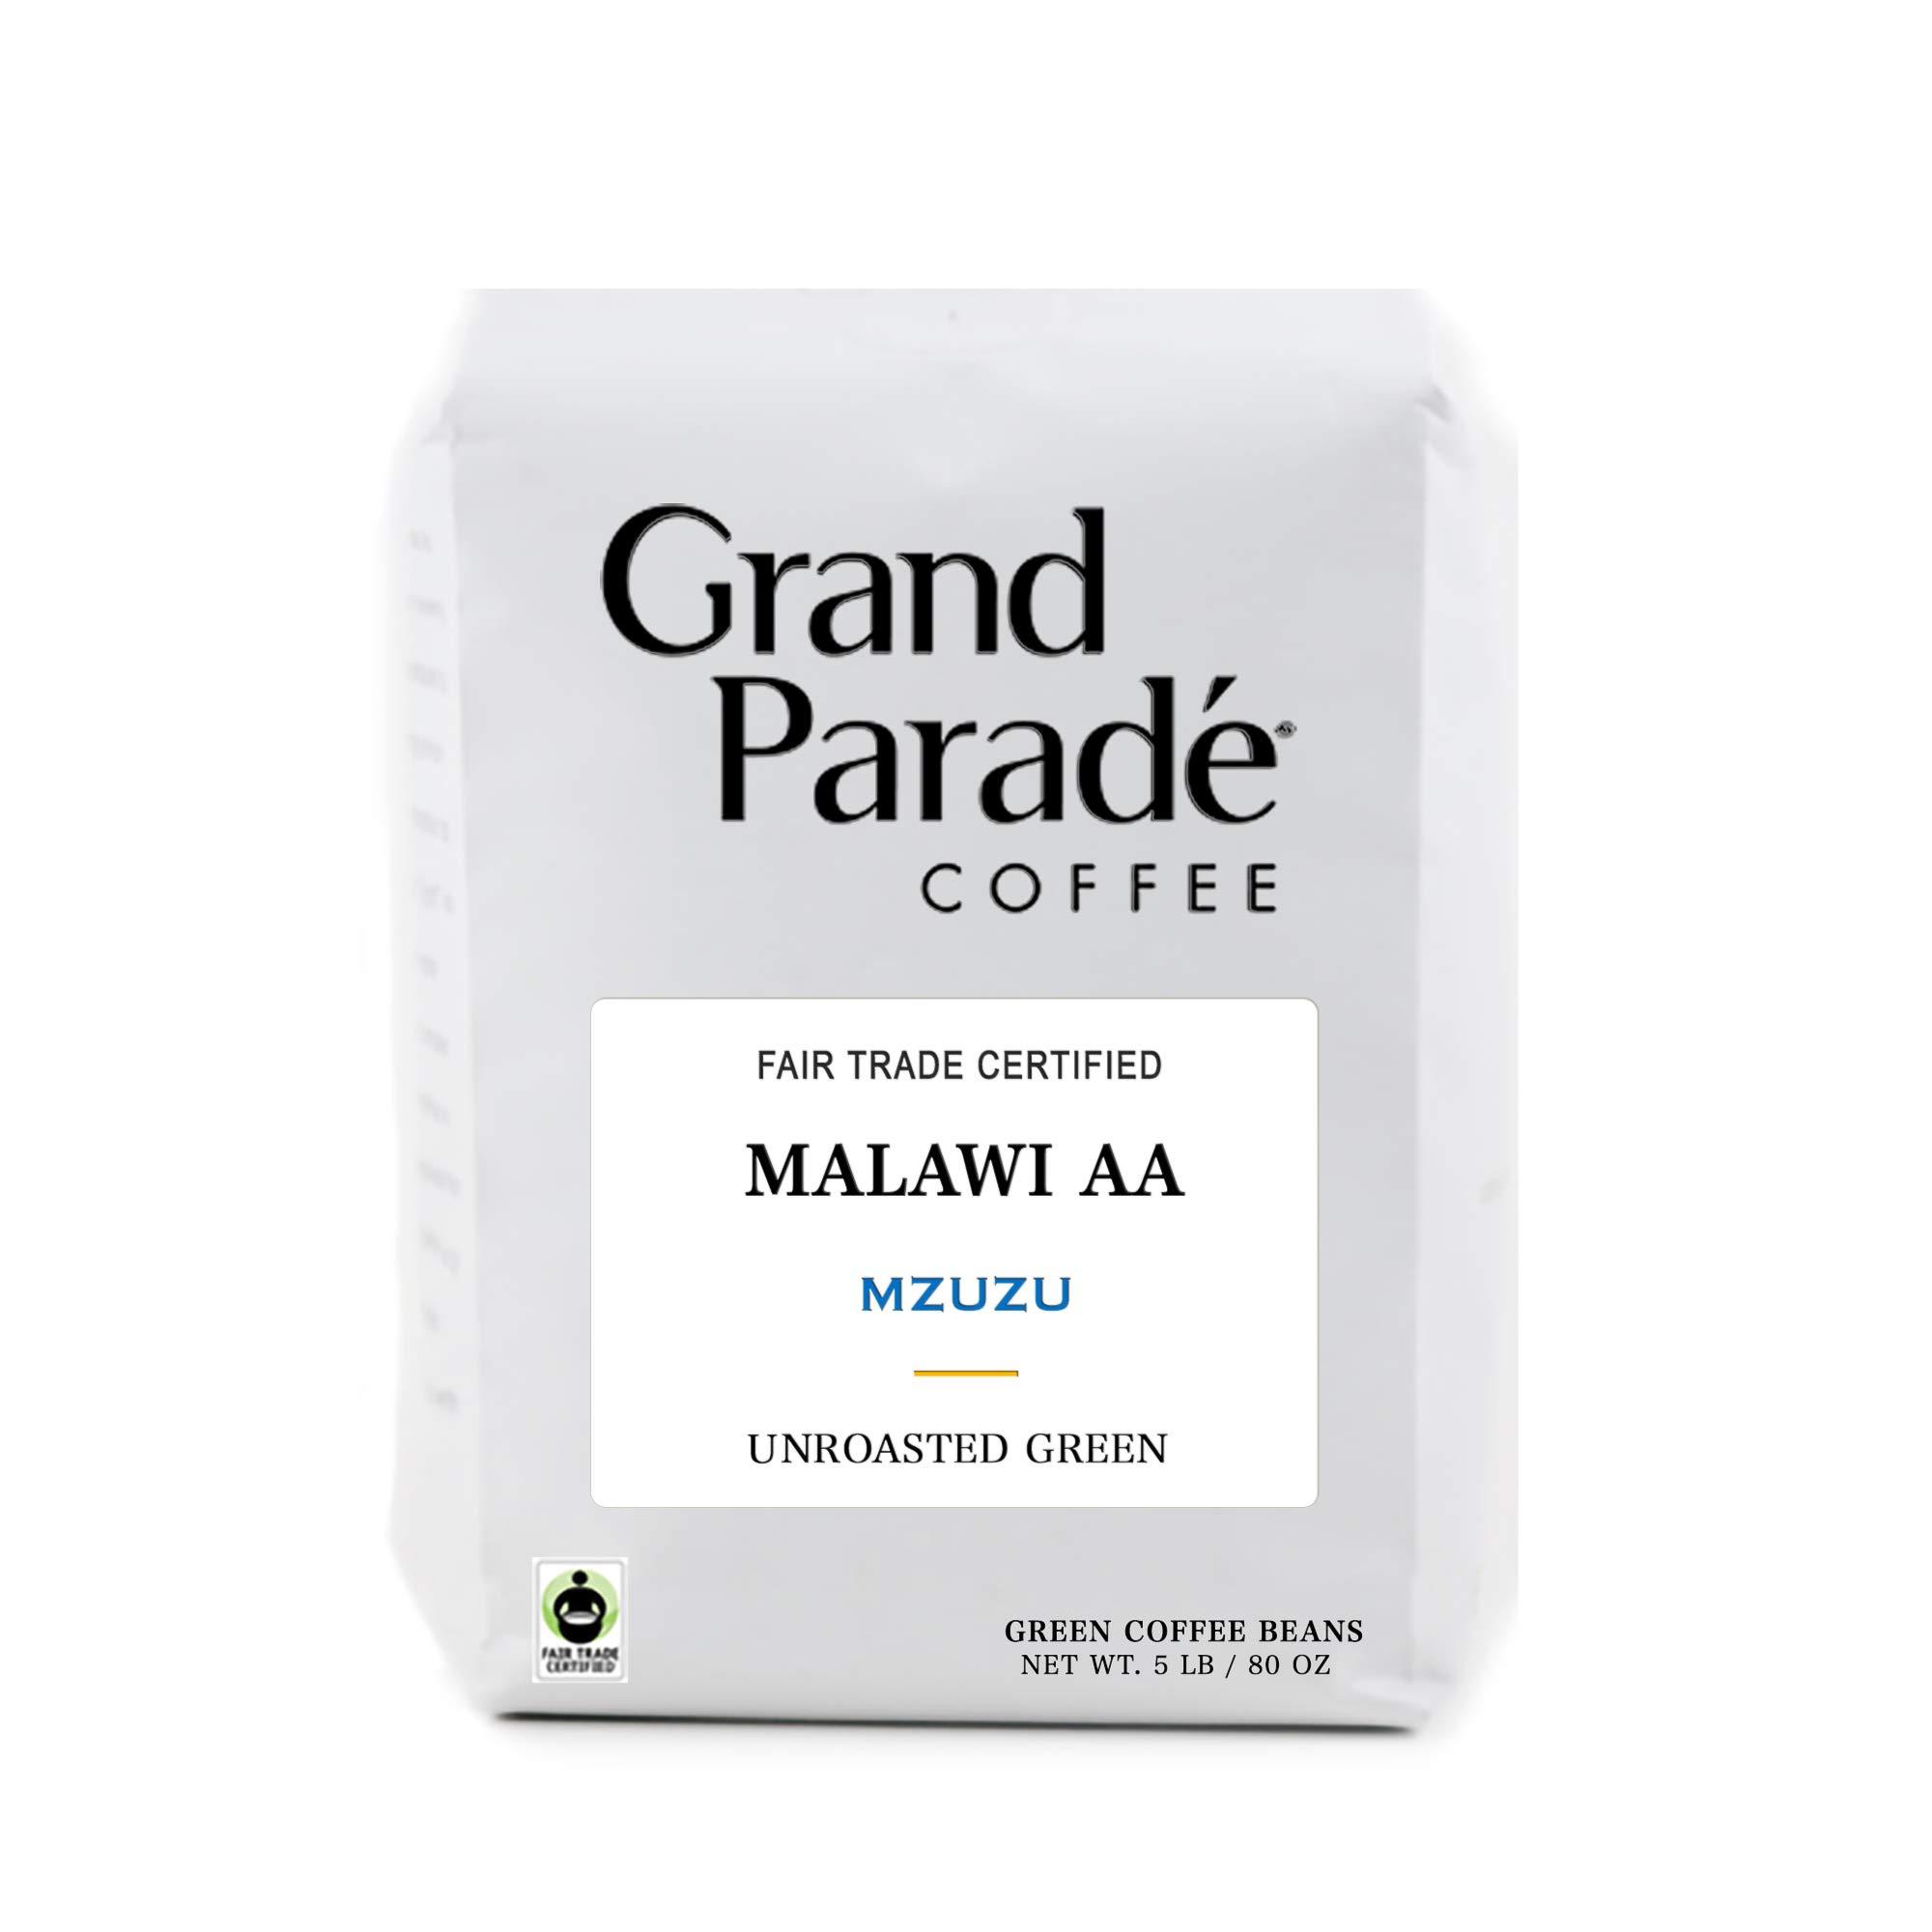 5 Lb Unroasted Green Coffee Beans Malawi Aa Mzuzu Single Origin